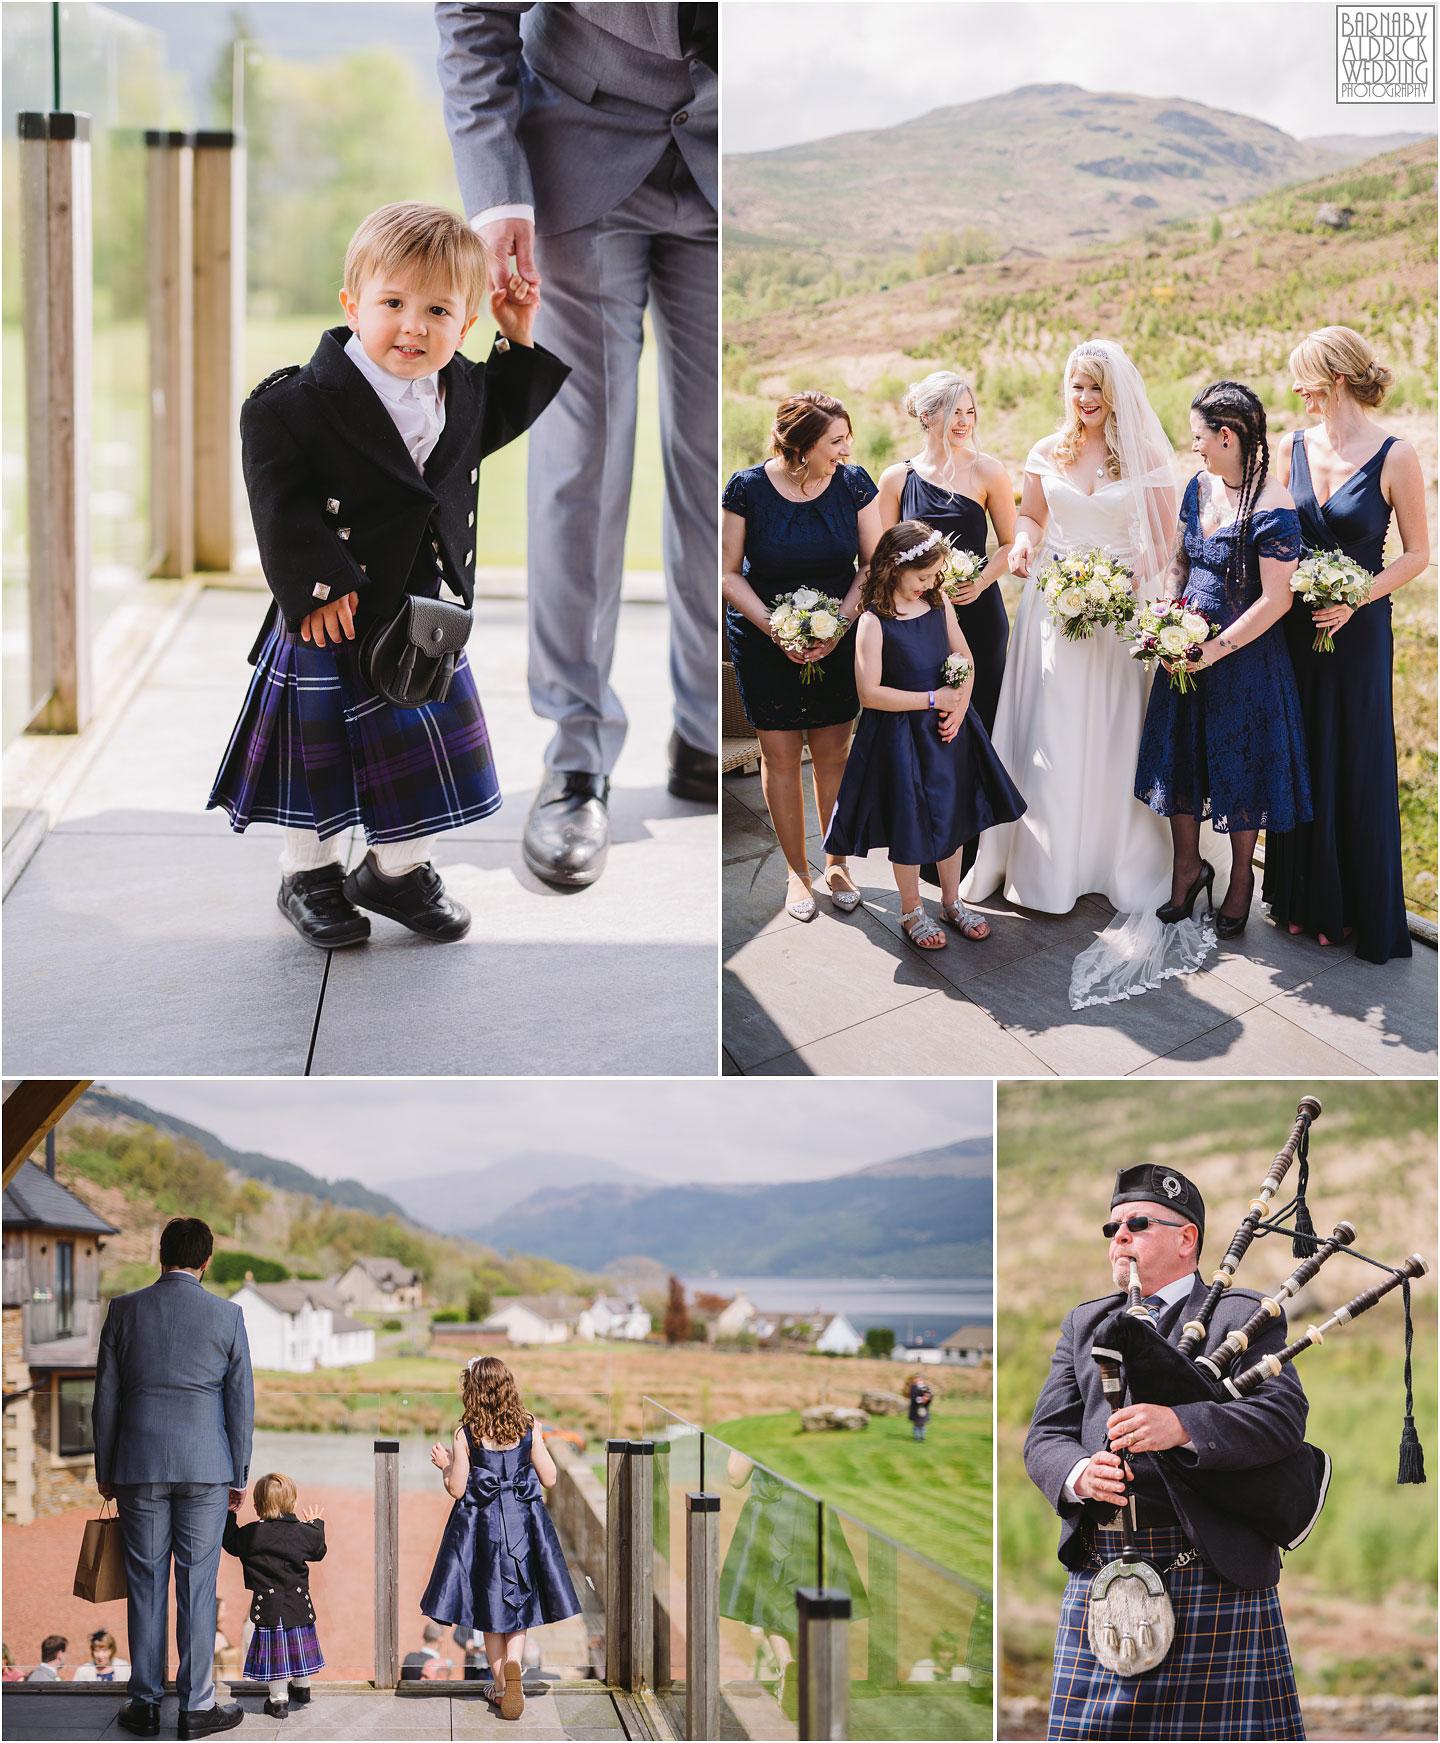 Tiny children's kilt, Child's Kilt Wedding at Carrick Castle Estate, Tam The Piper Loch Goil Wedding photos, Argyll Forest Park Wedding Scotland, Scottish Wedding, Scottish Lockdown Wedding, Scottish Wedding